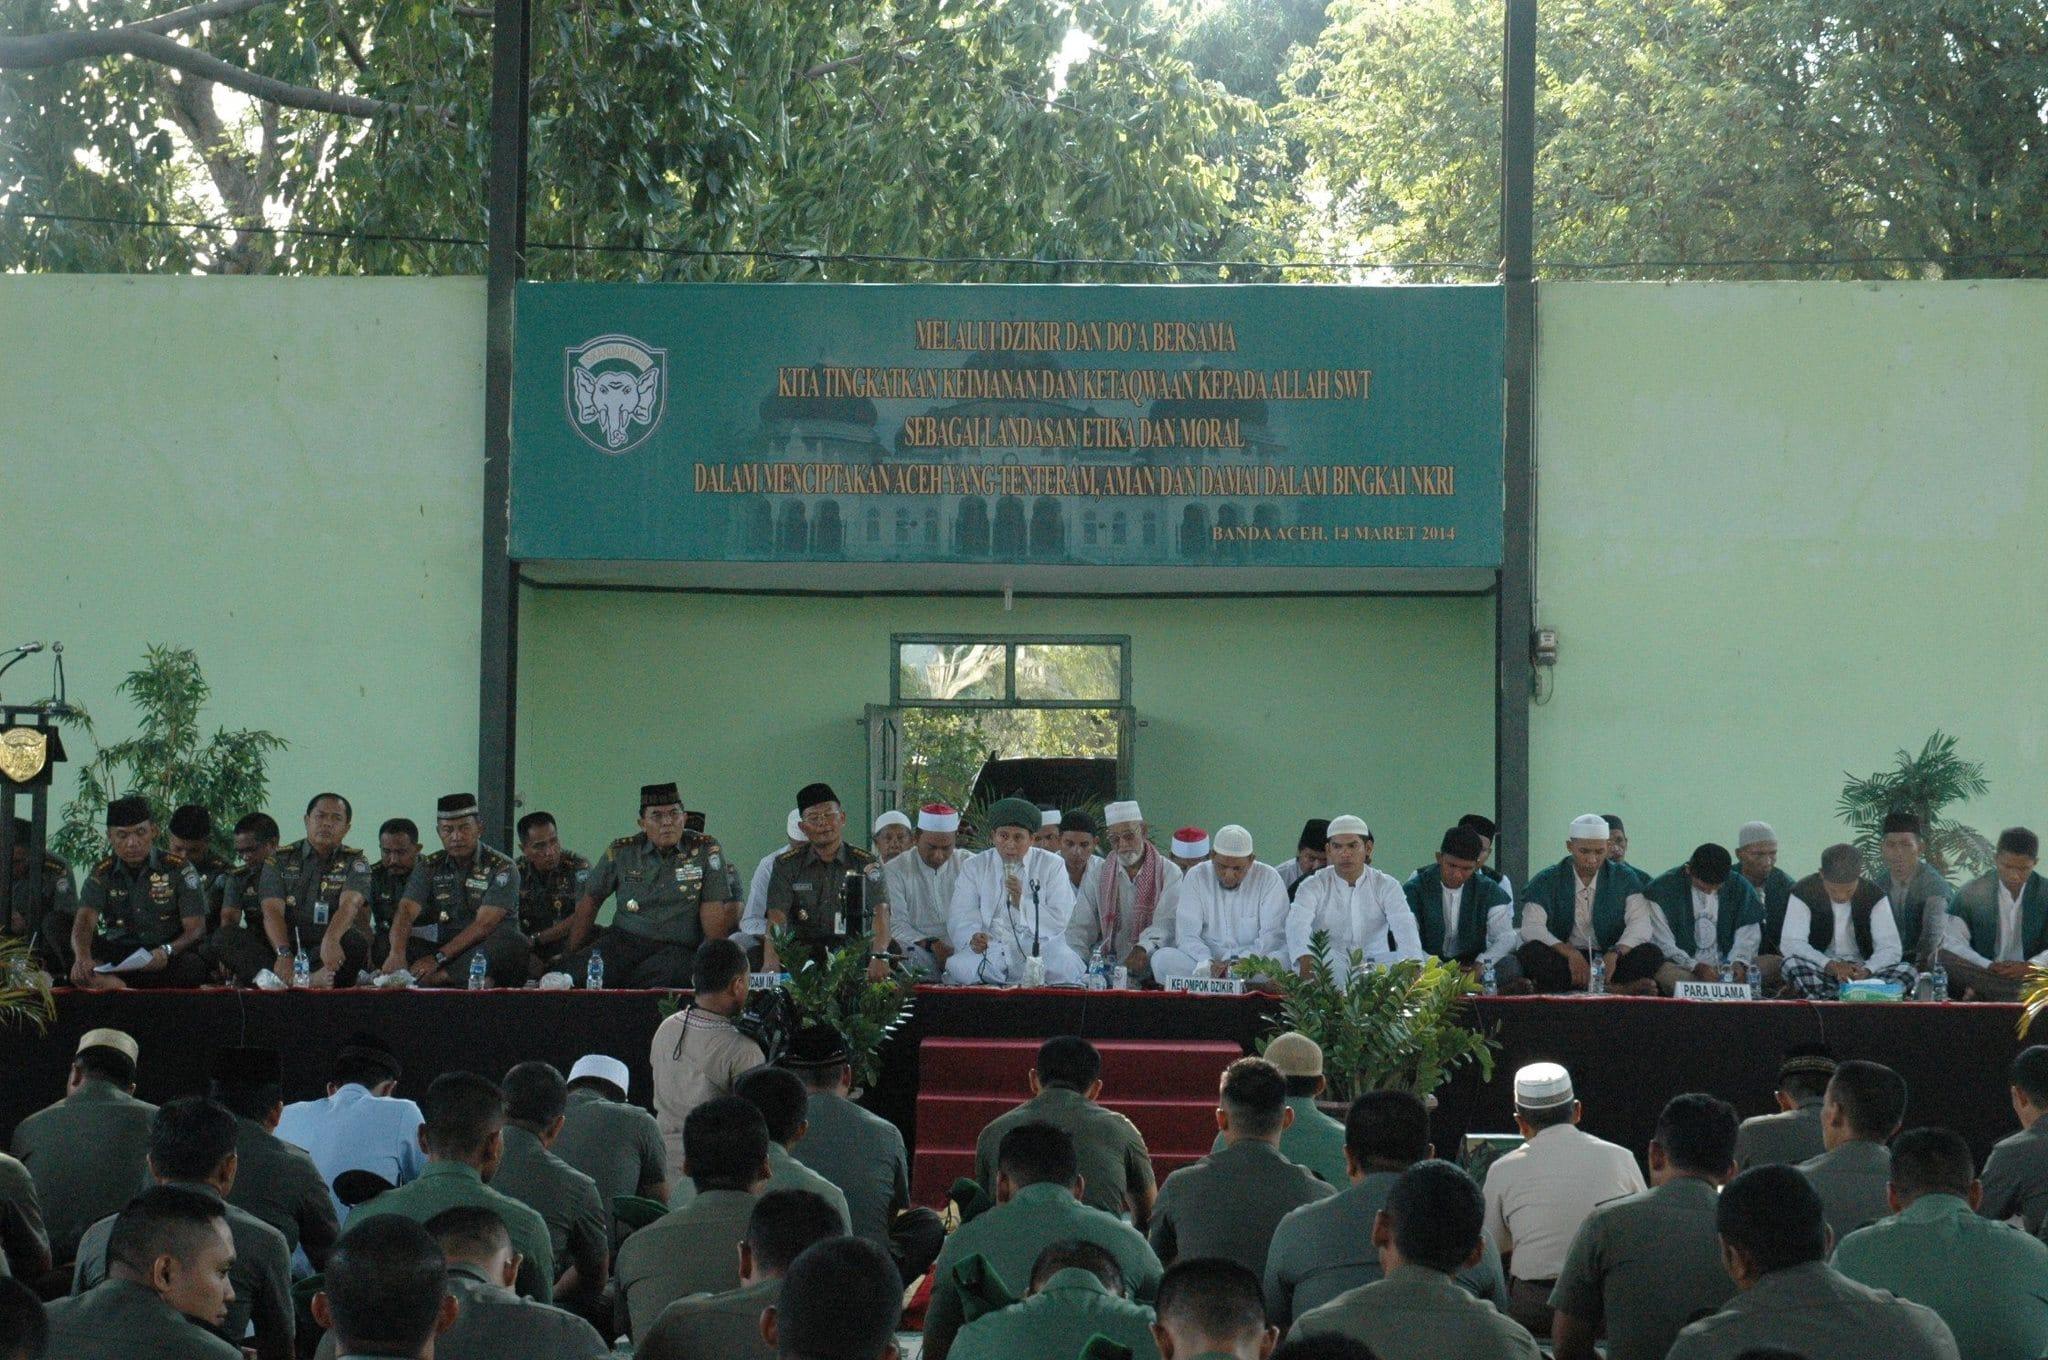 Ratusan Prajurit Kodam Zikir Bersama Dengan Masyarakat